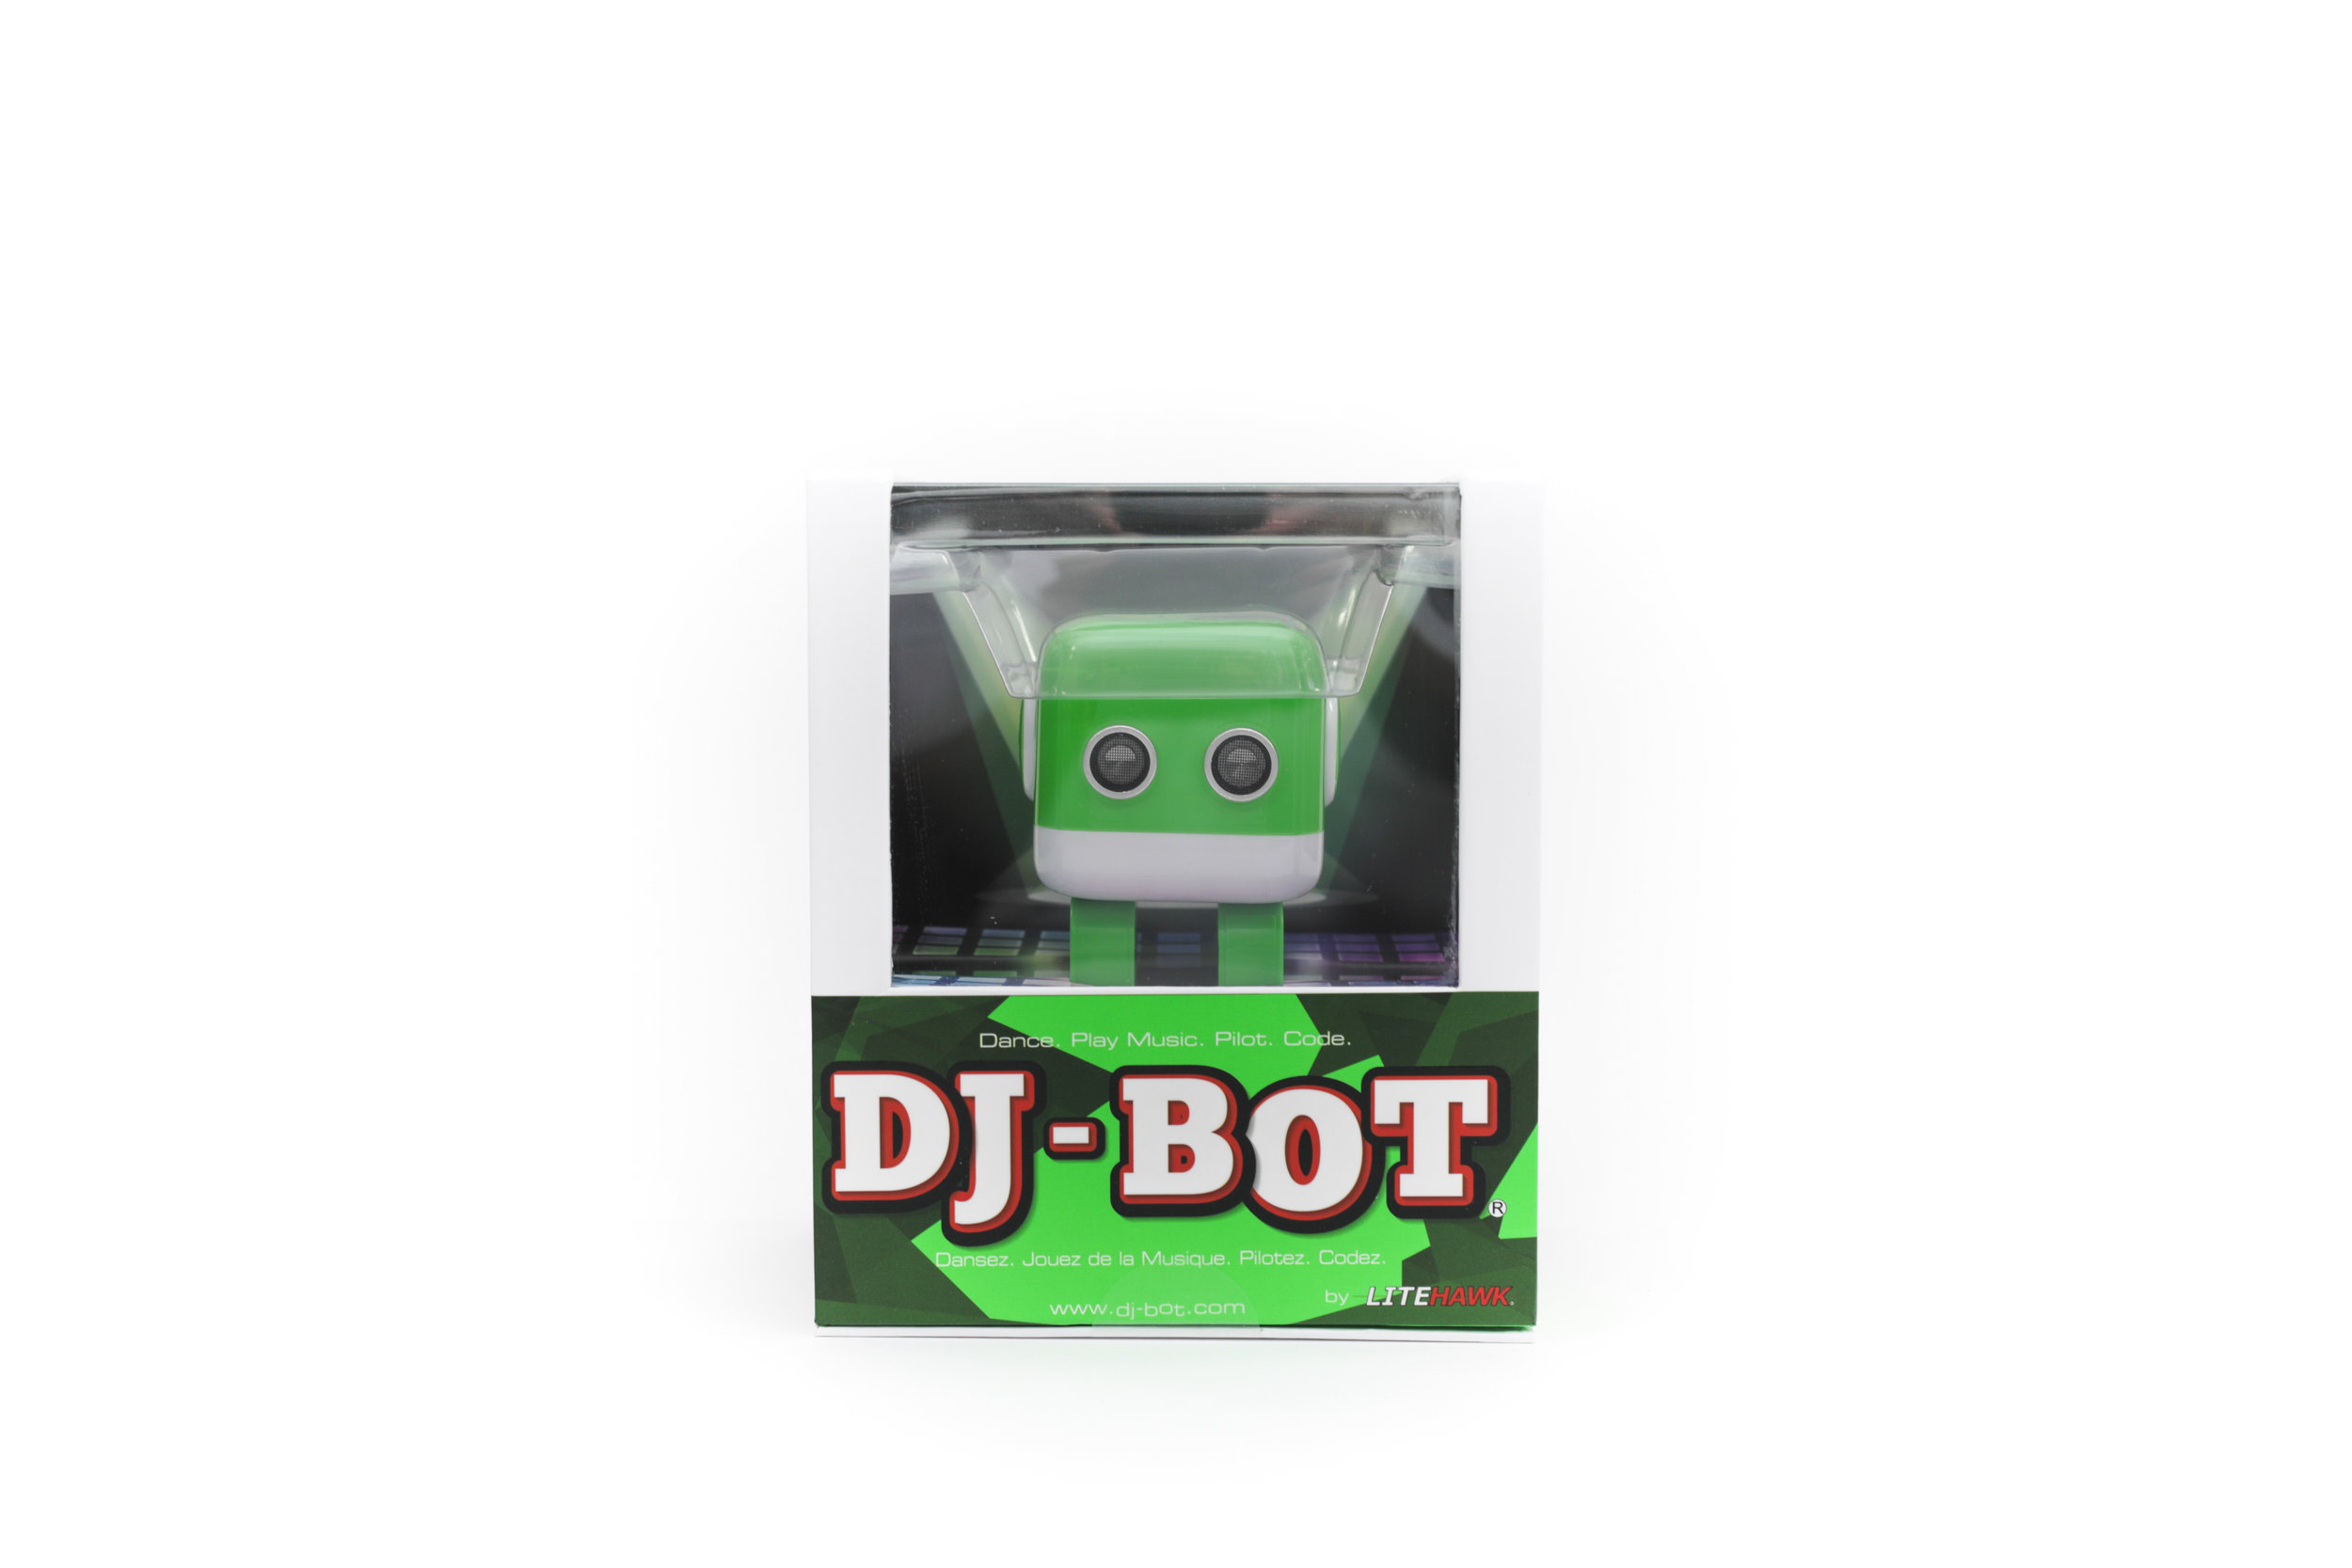 DJ BOT Box (5 of 6).jpg